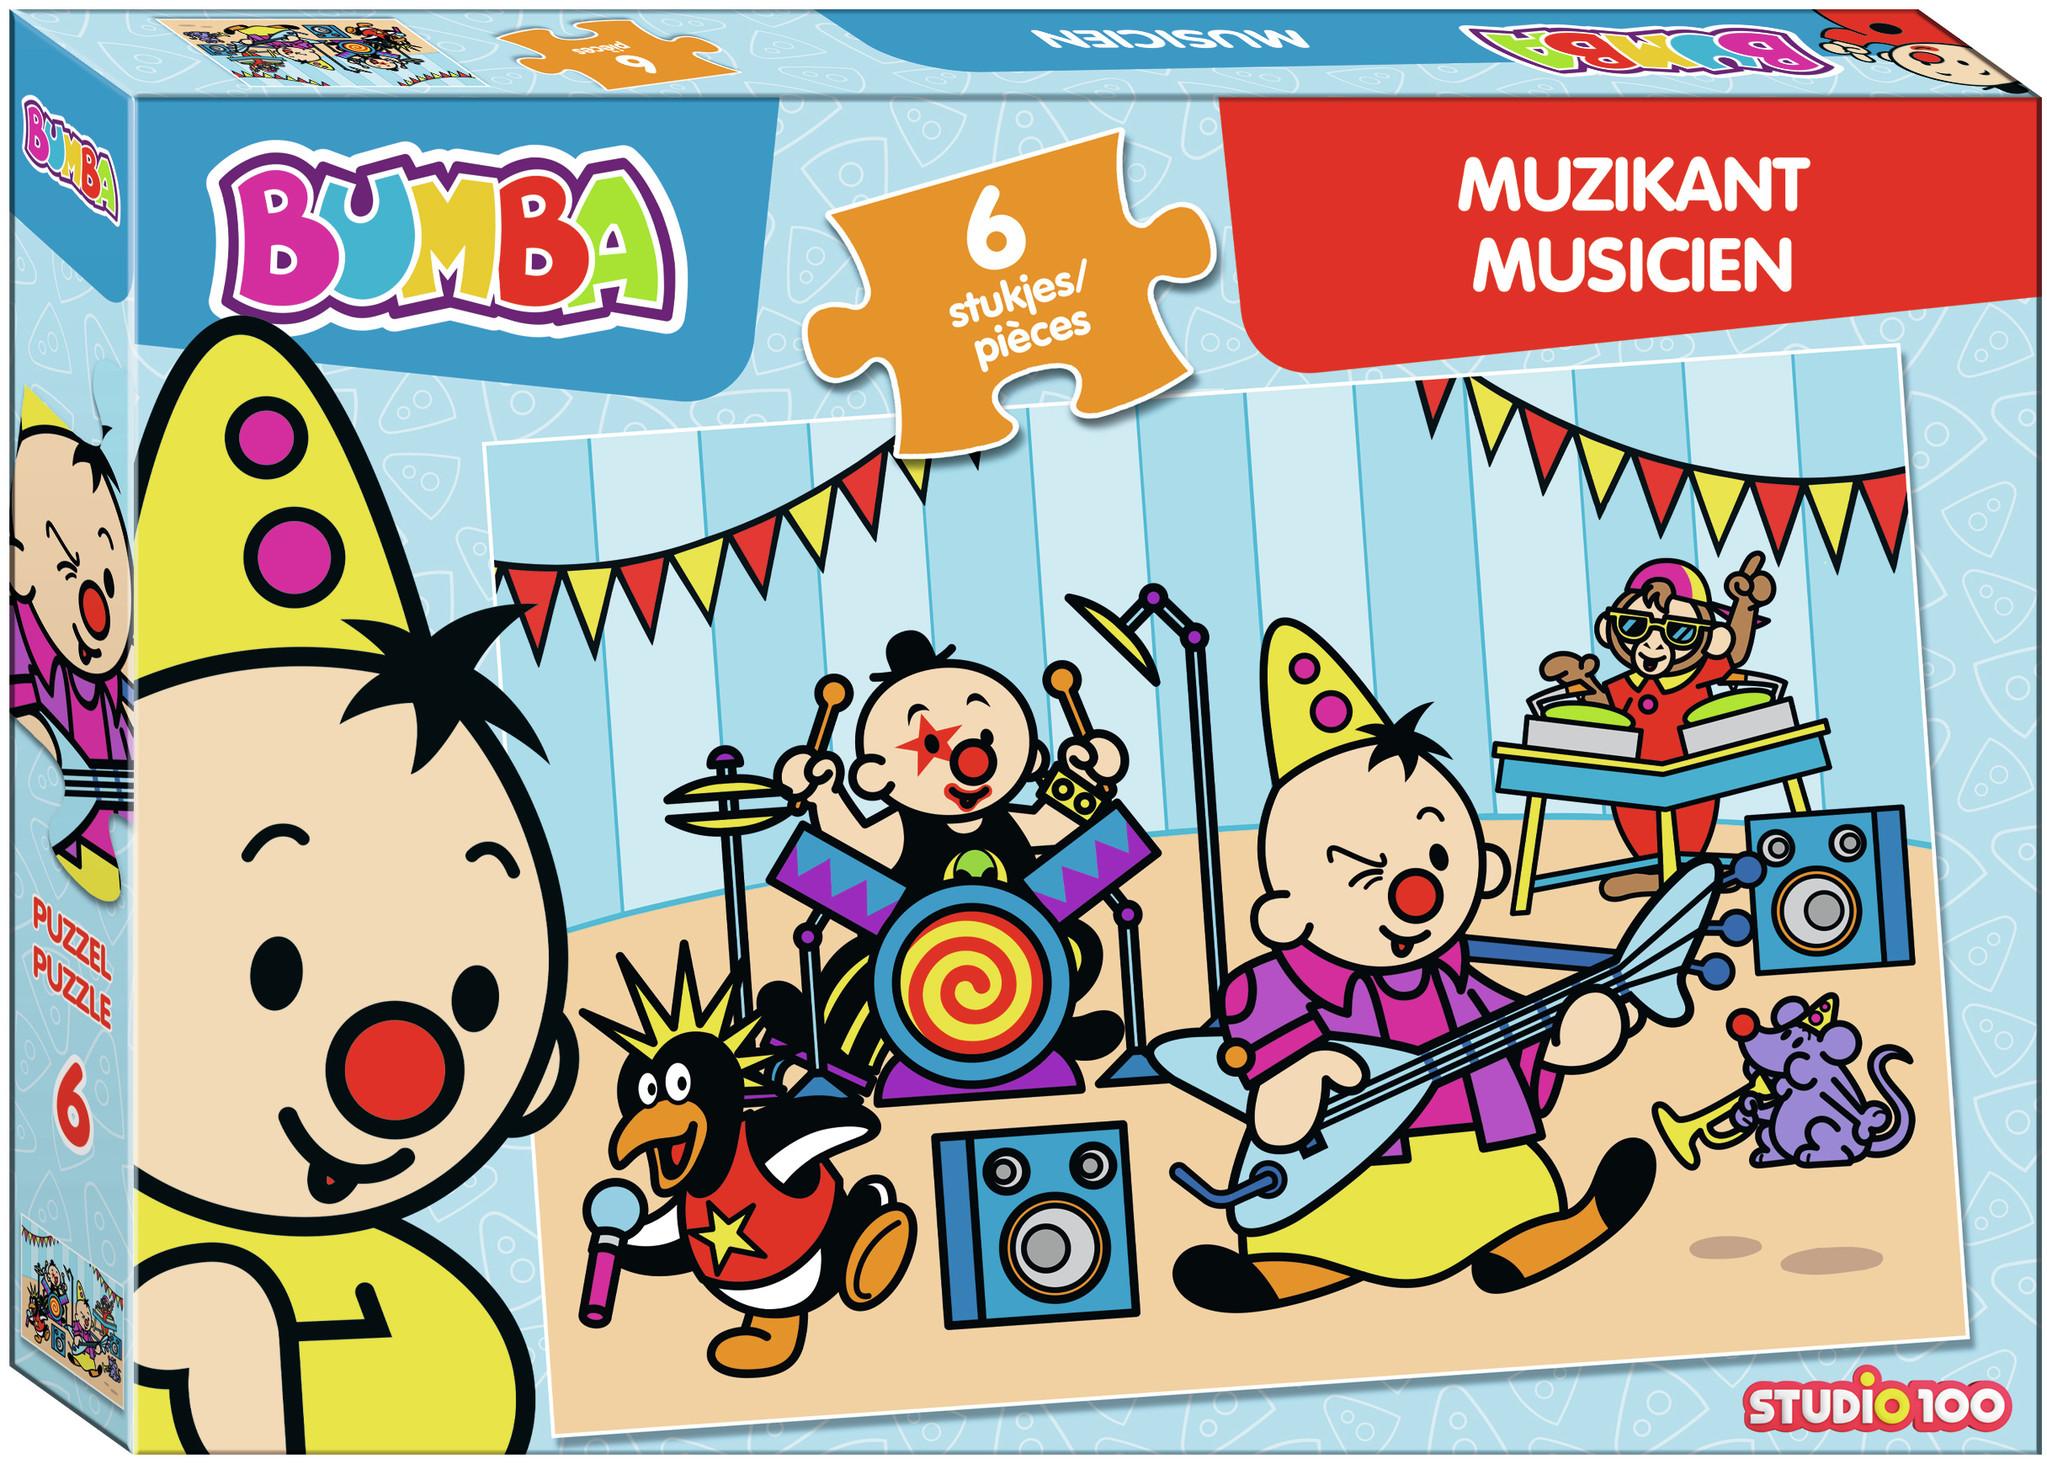 Puzzel Bumba muzikant Bumba: 6 stukjes